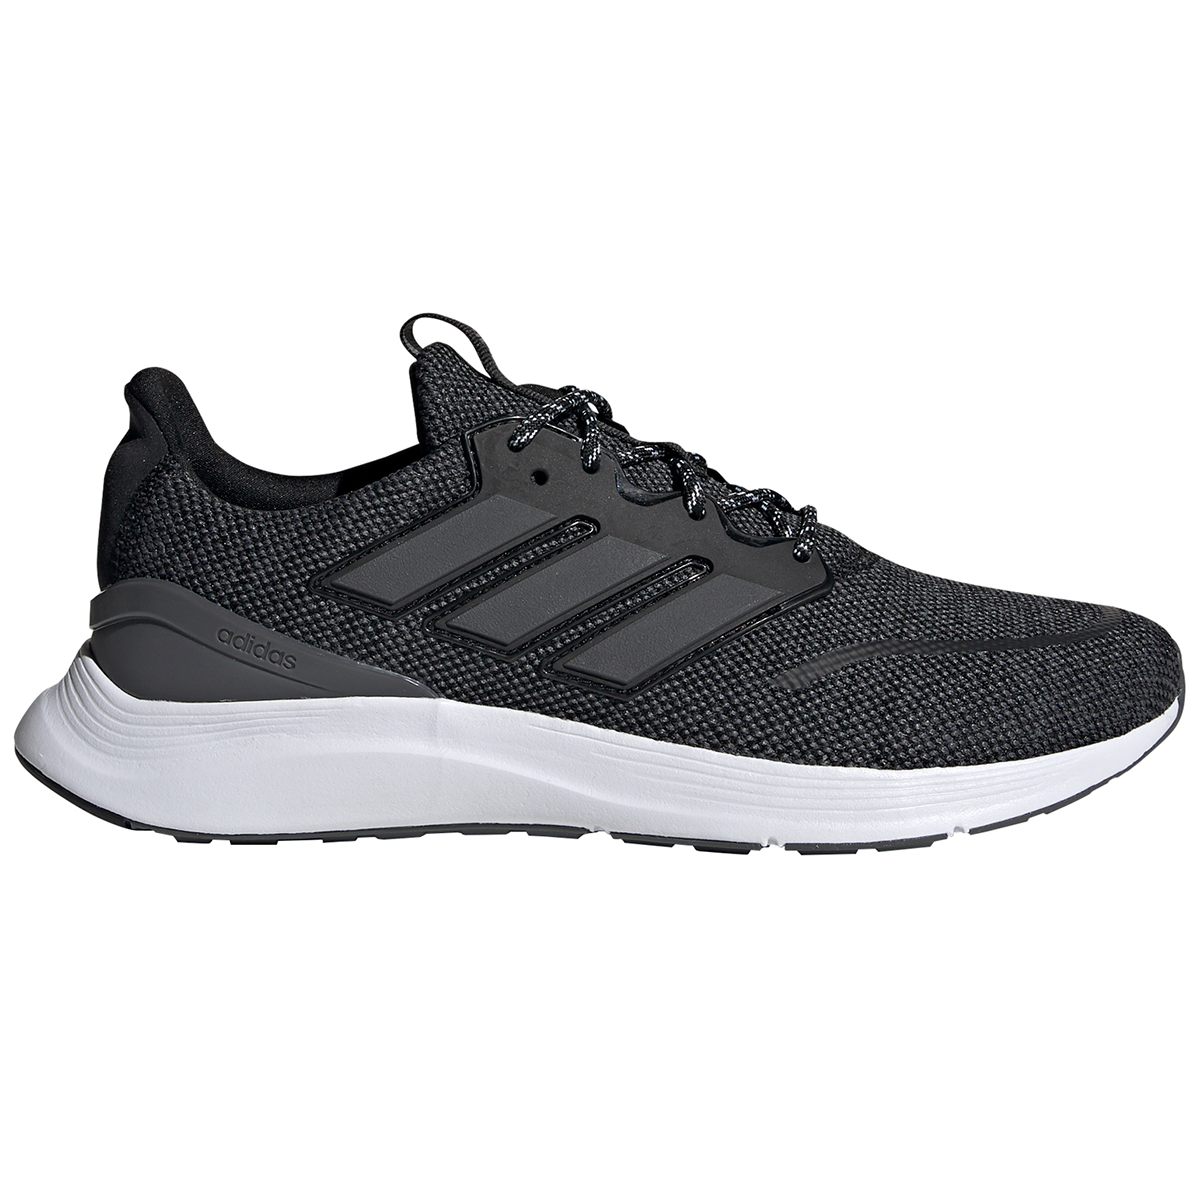 Adidas Men's Energy Falcon Running Shoes - Black, 9.5